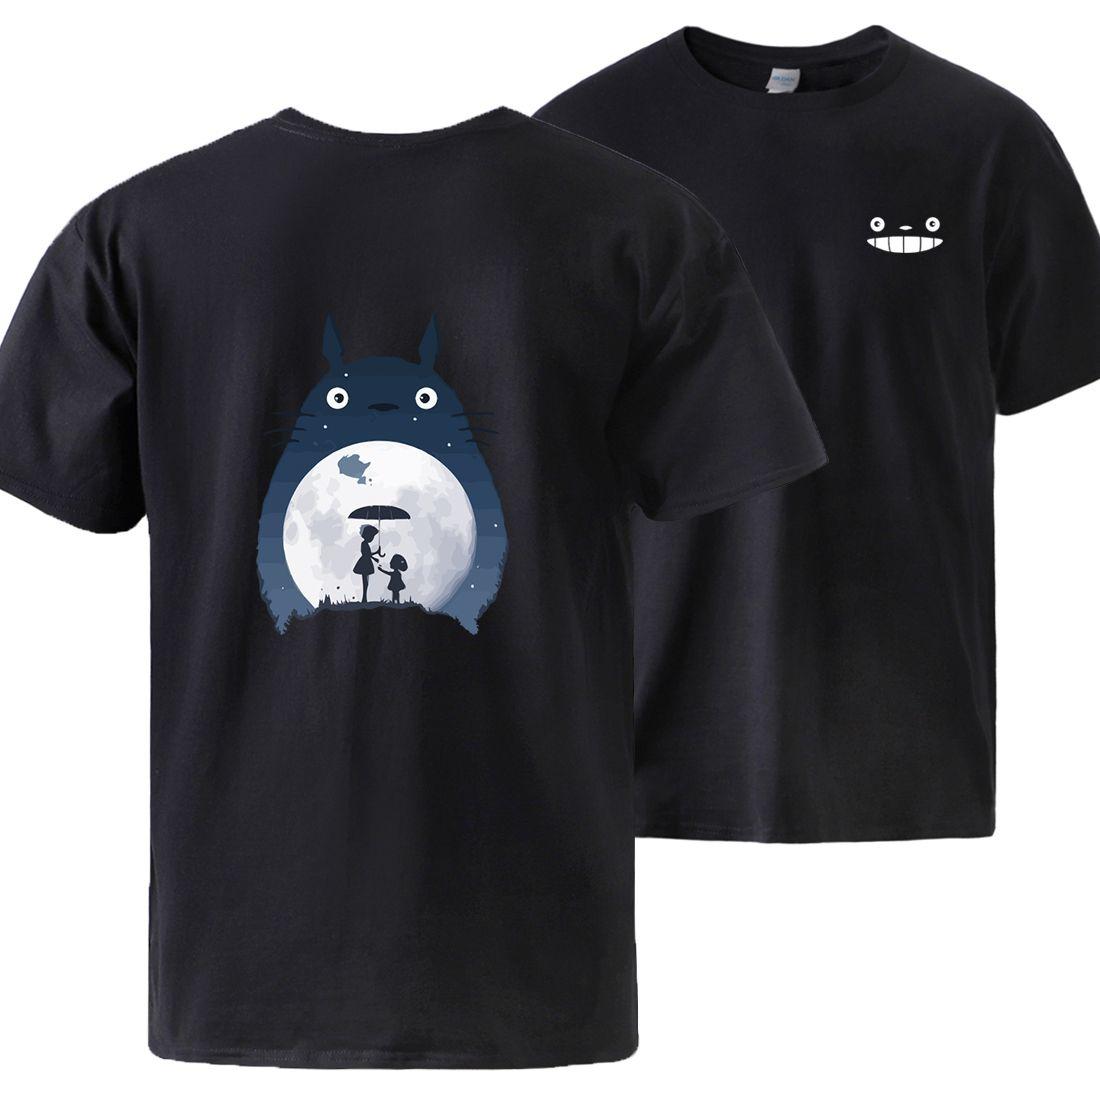 Totoro Cartoon Kurzarmshirts Cotton Print Sommer-T-Shirt 2020 Mann Marken-Qualitäts-Japan Anime-Druck-T-Shirts Top-lose T